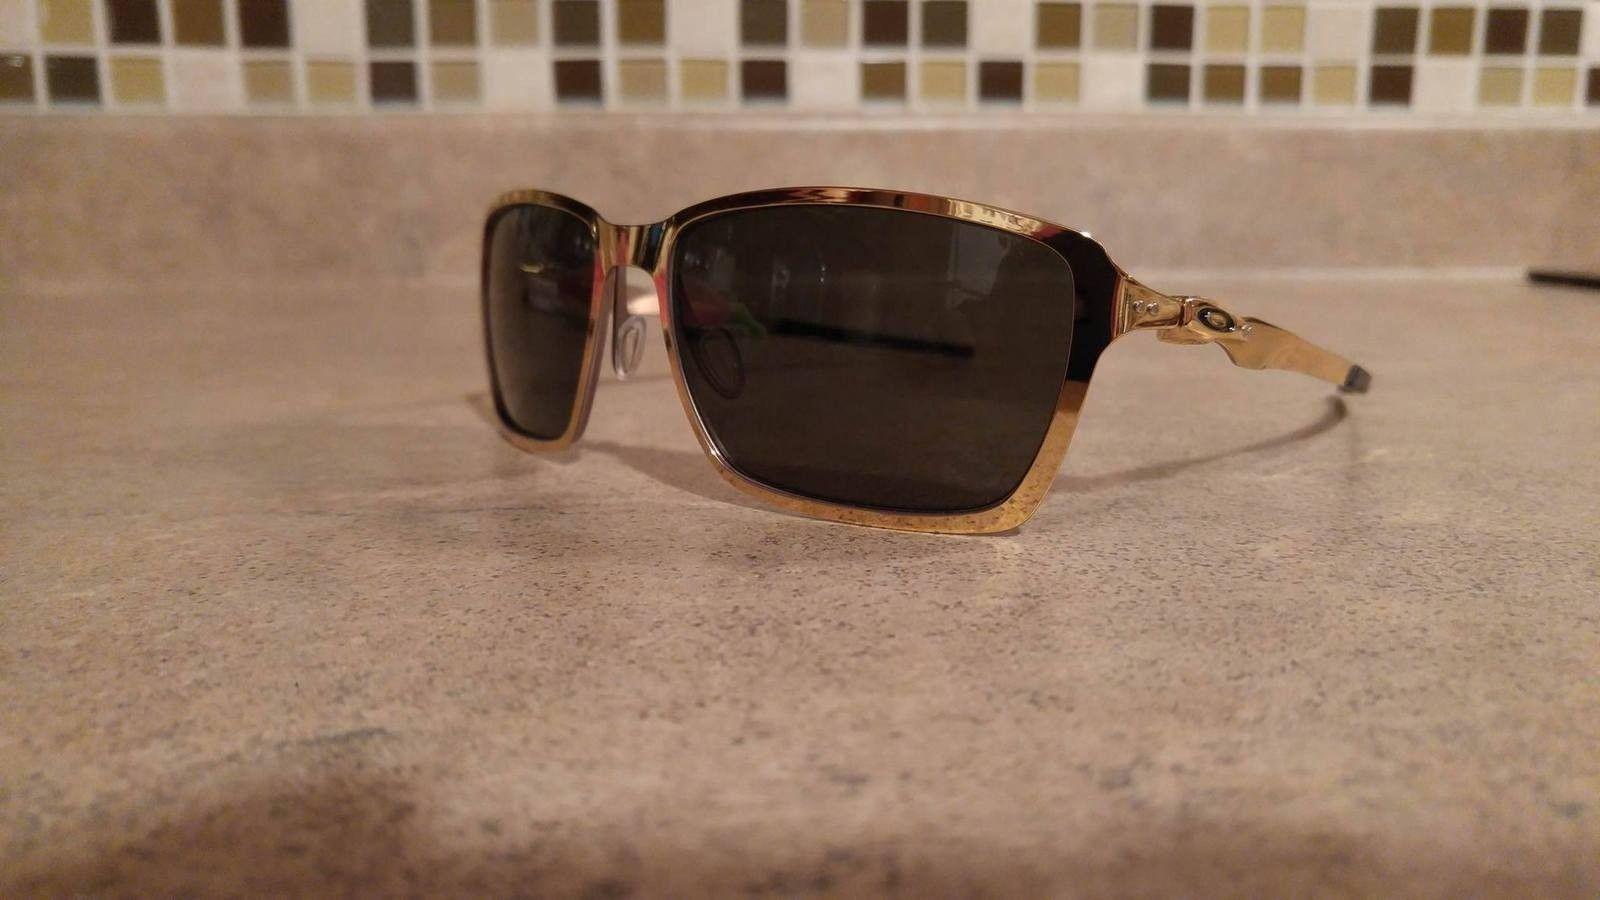 Staple Jawbone and polished gold Tincan - 12334266_10156285364520481_1815866656_o.jpg